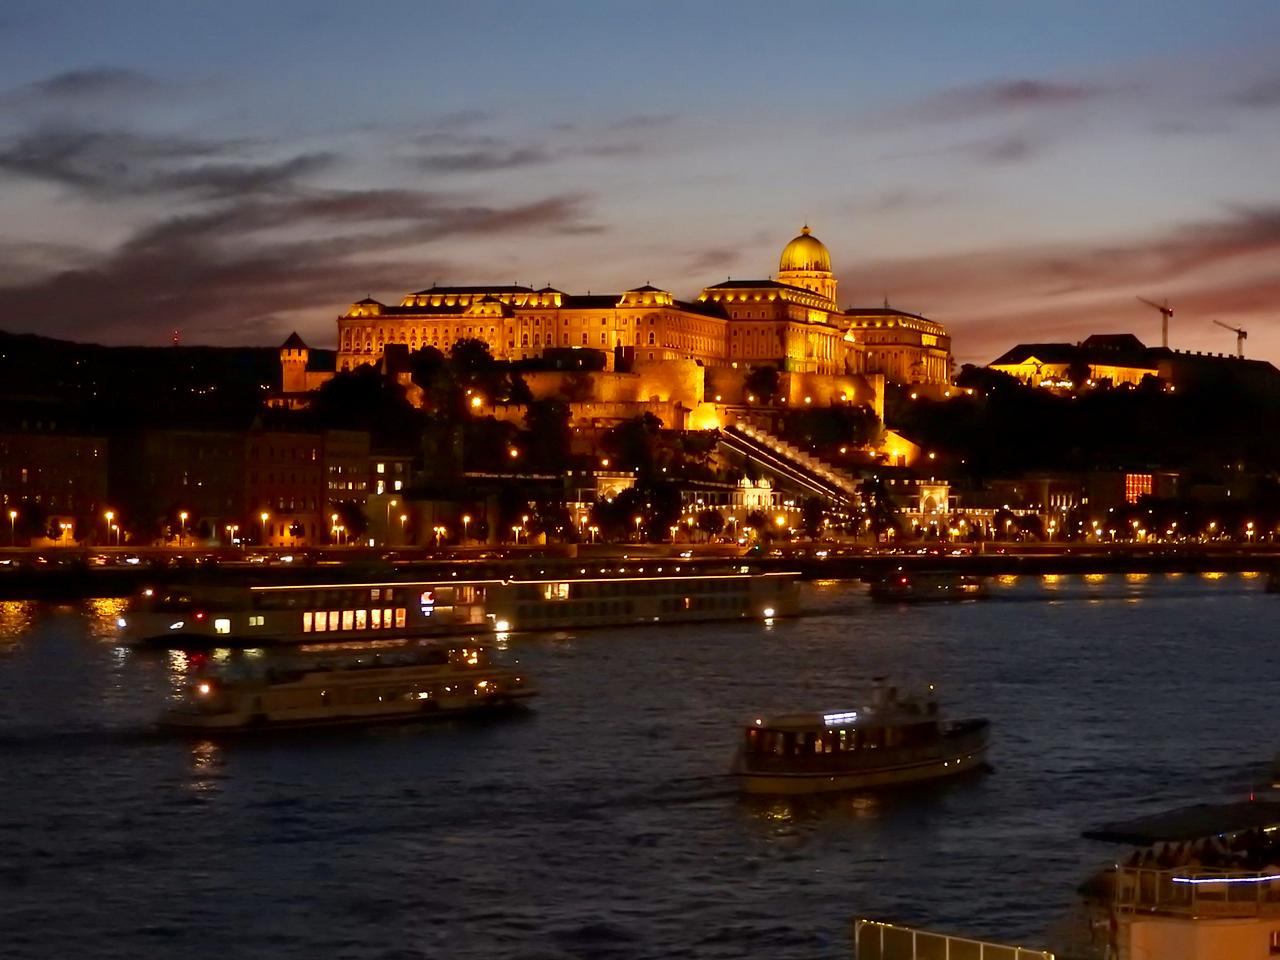 Budapest Nye Cruise Amp Magician Show Budapest River Cruise